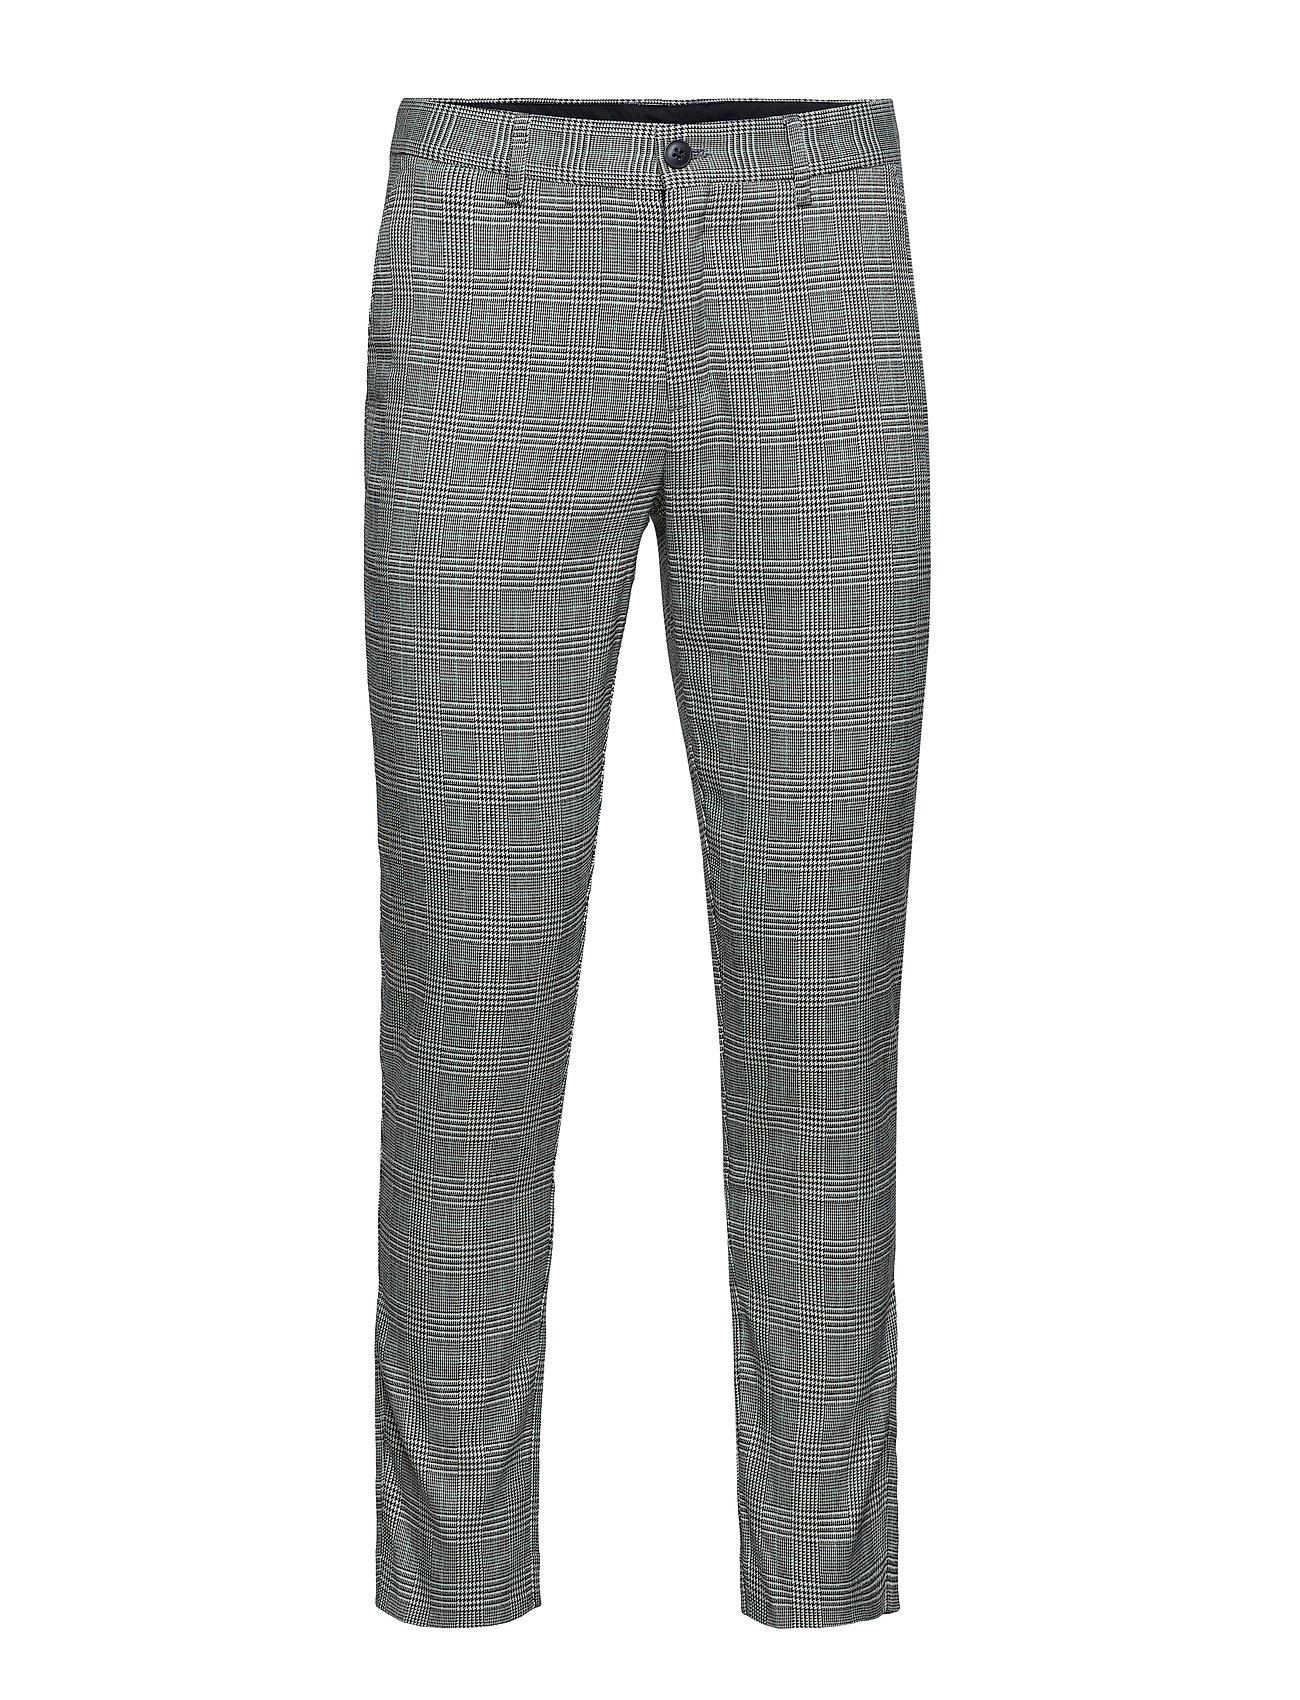 JUNK de LUXE Prince of Wales club pants - GREY MIX